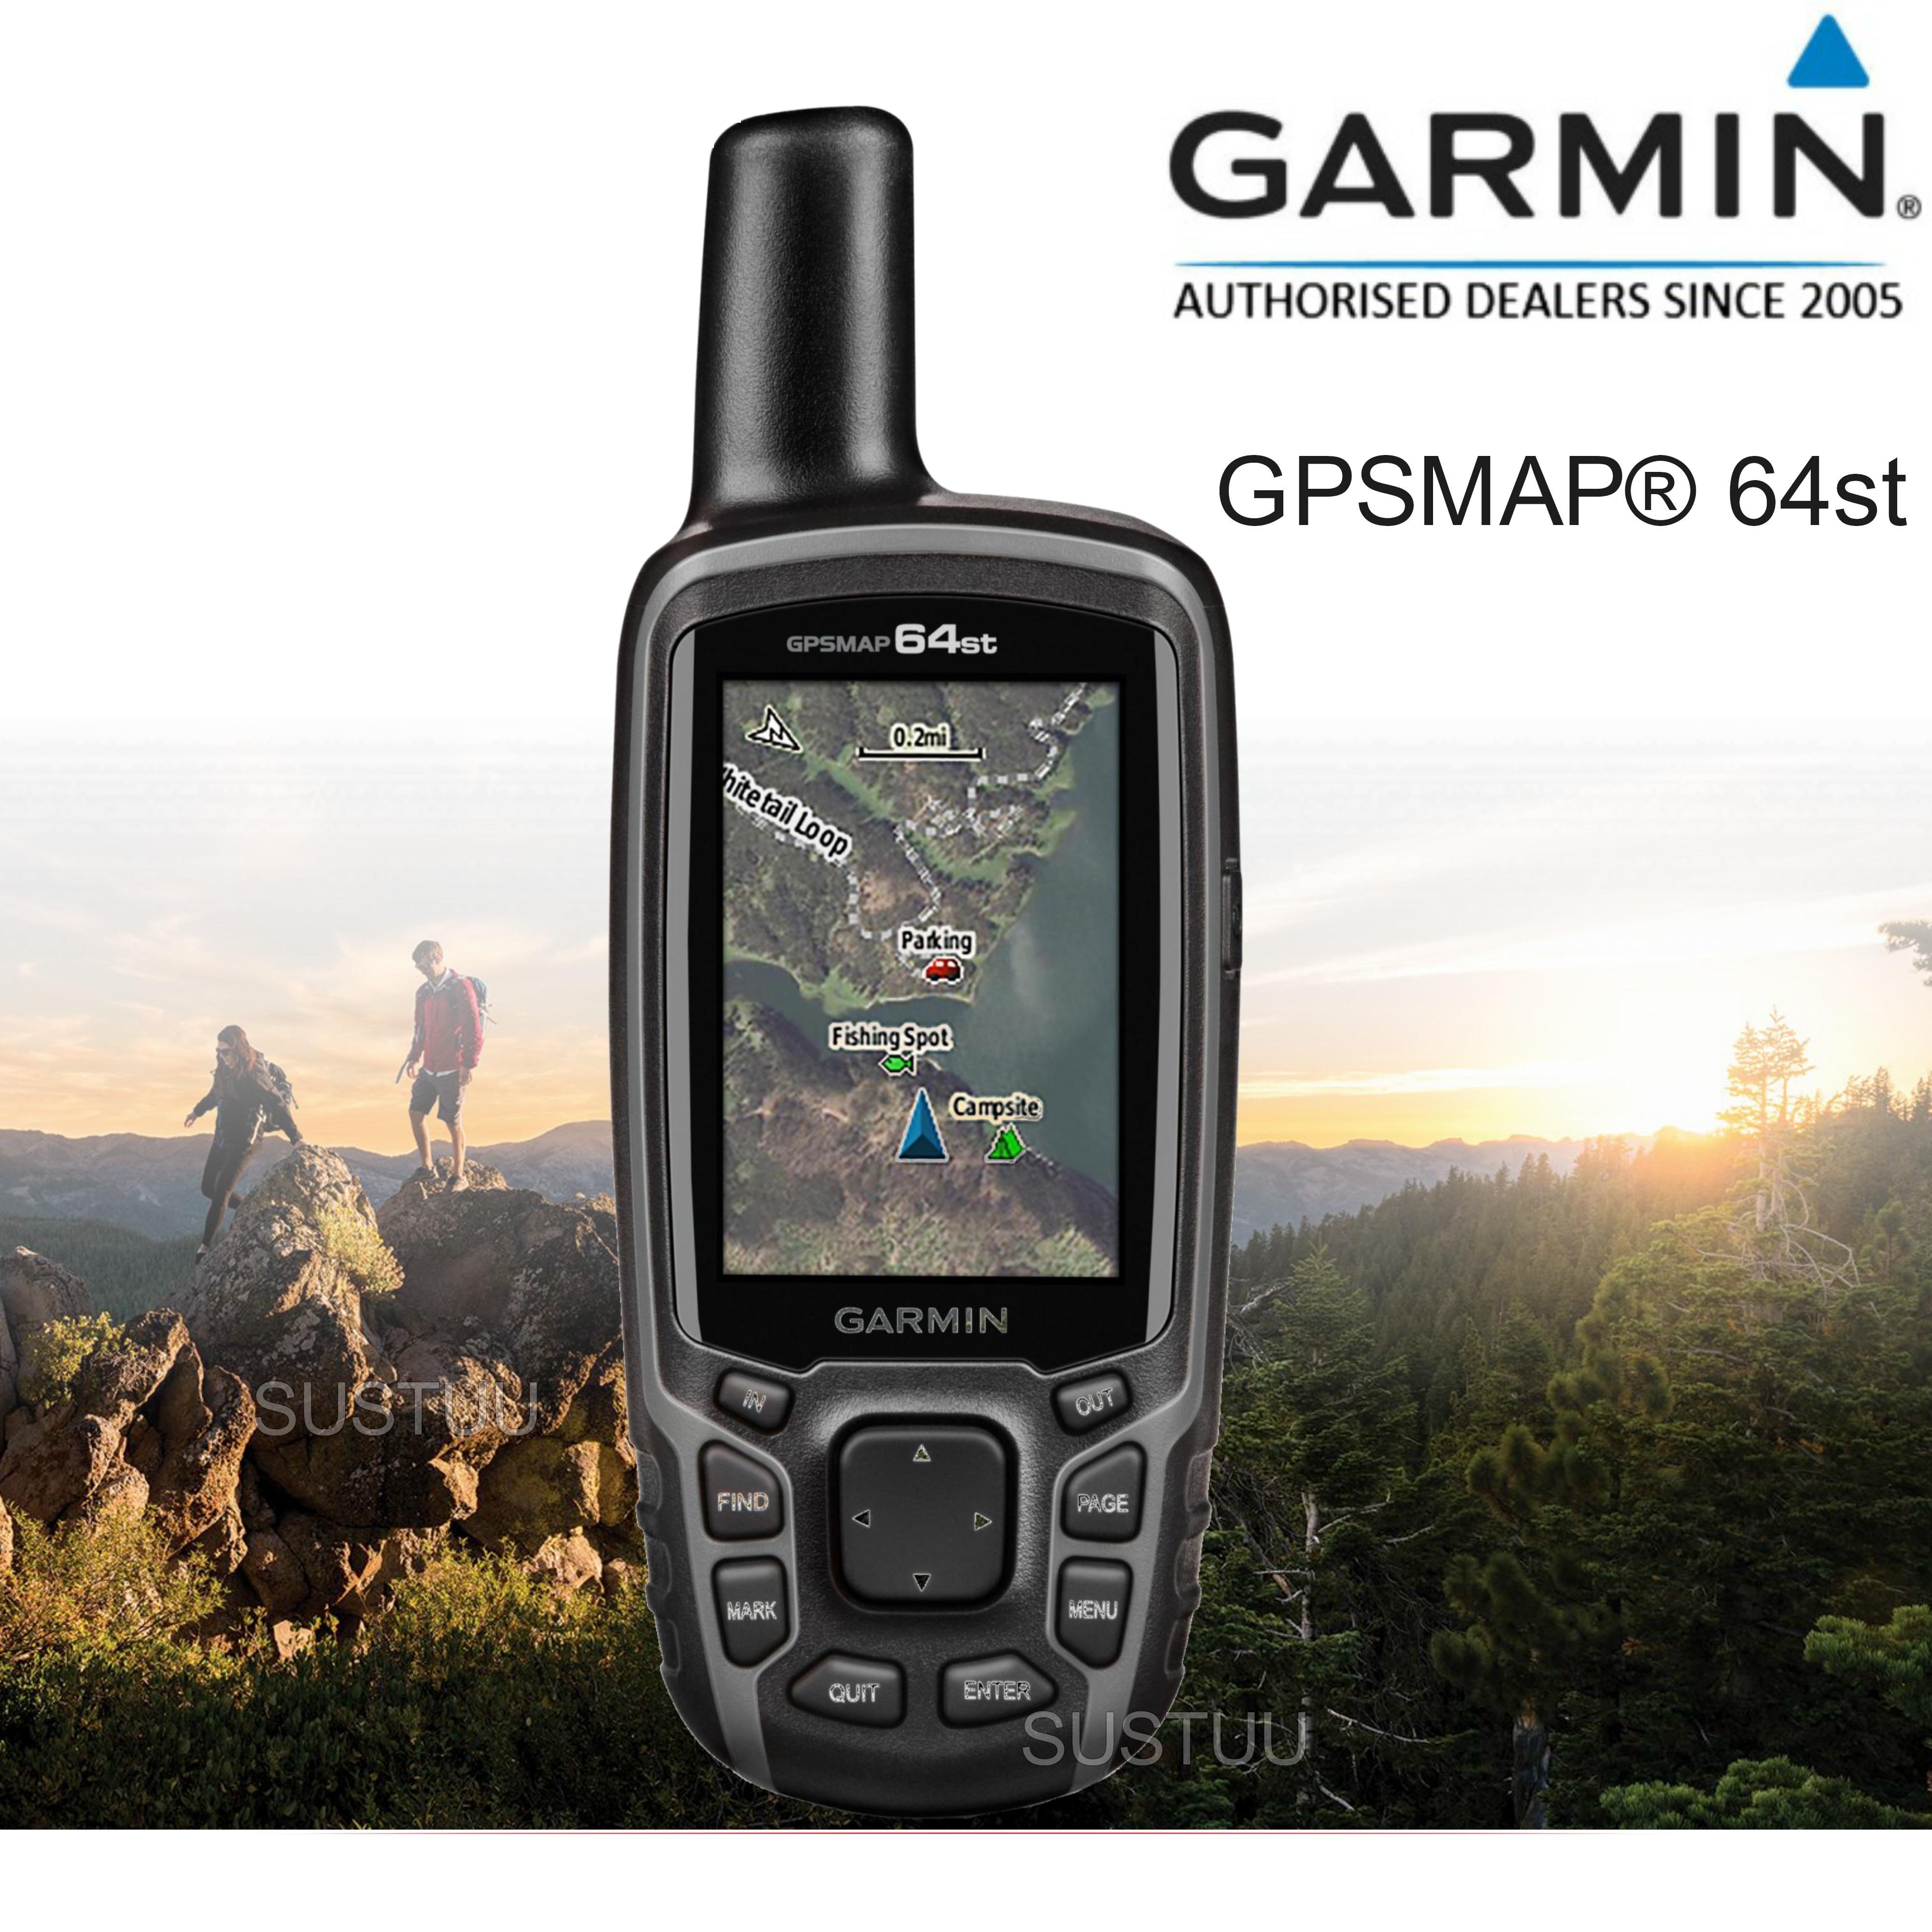 Garmin GPSMAP 64st|Handheld GPS-GLONASS Navigator|Compass|Preloaded Europe Maps